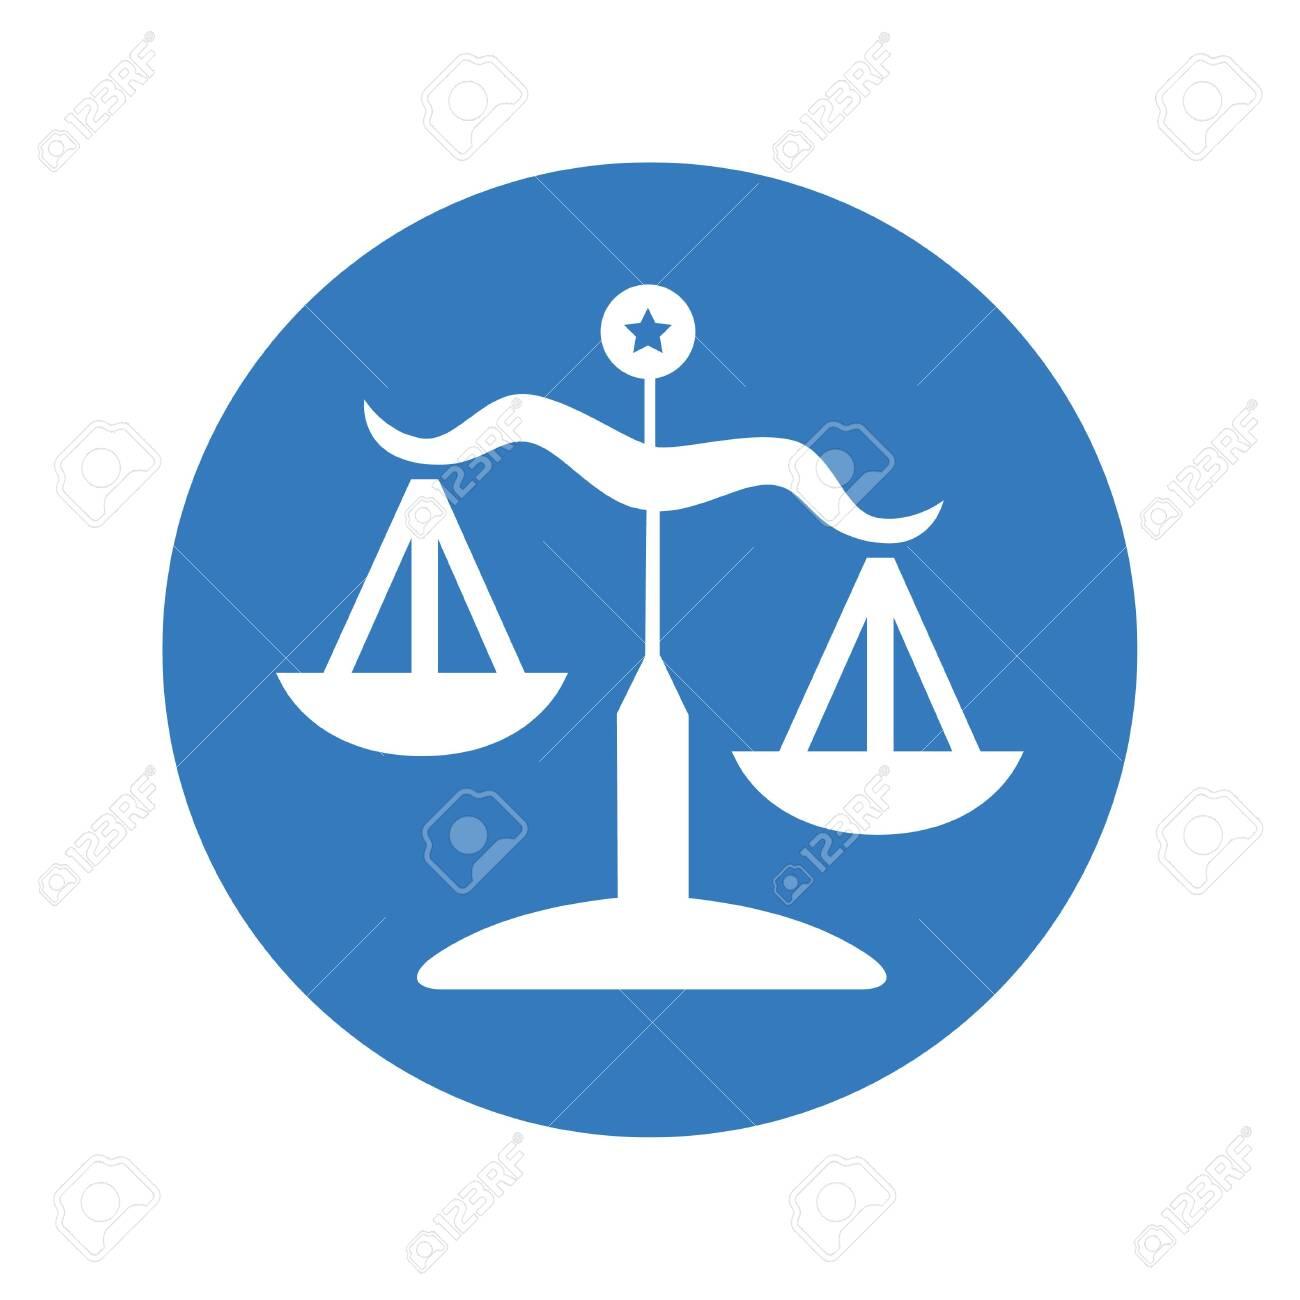 balance / measurement icon - 137169567